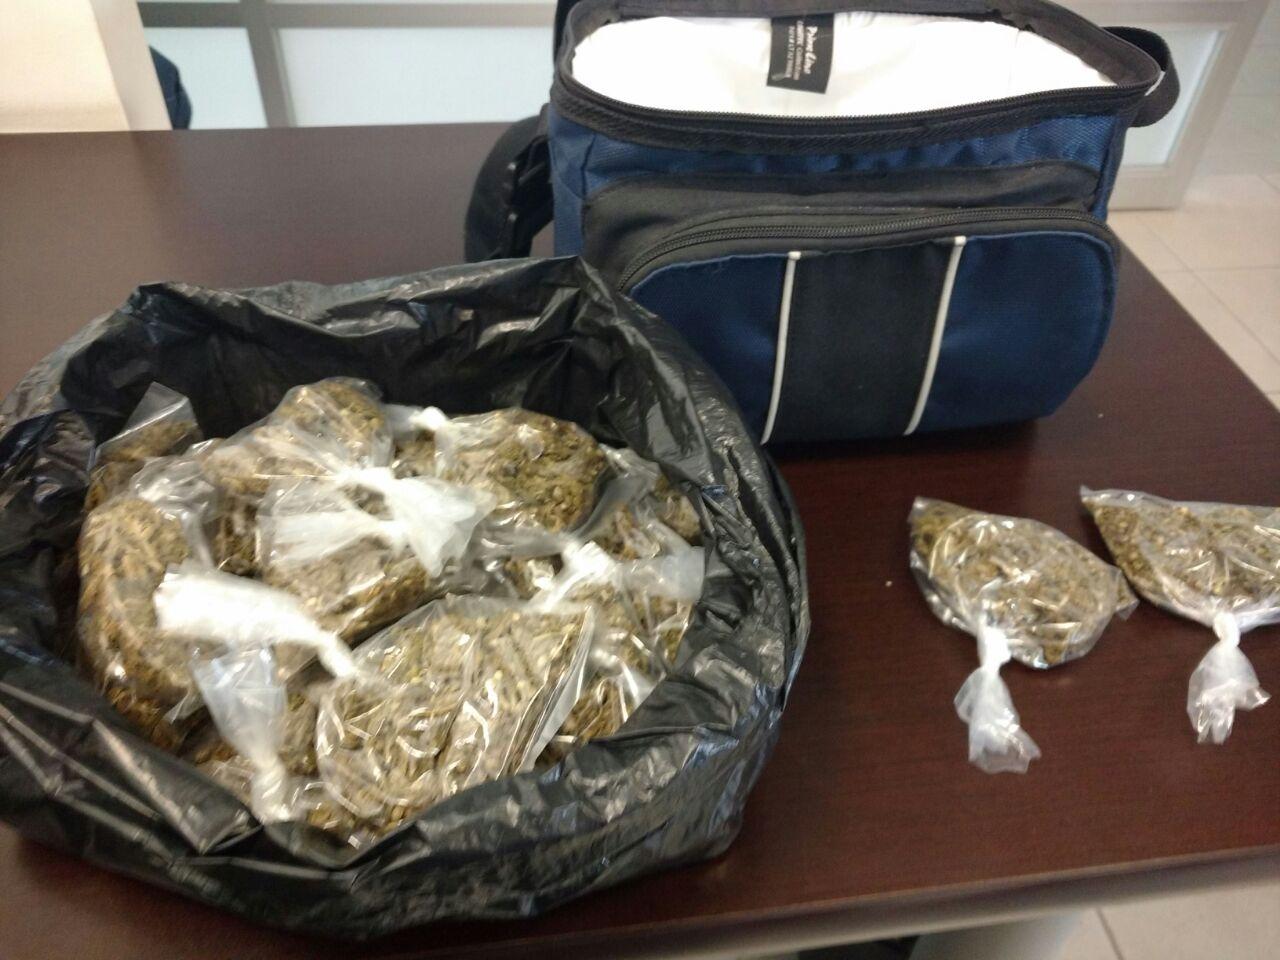 Consignan a importante narcodistribuidor de marihuana